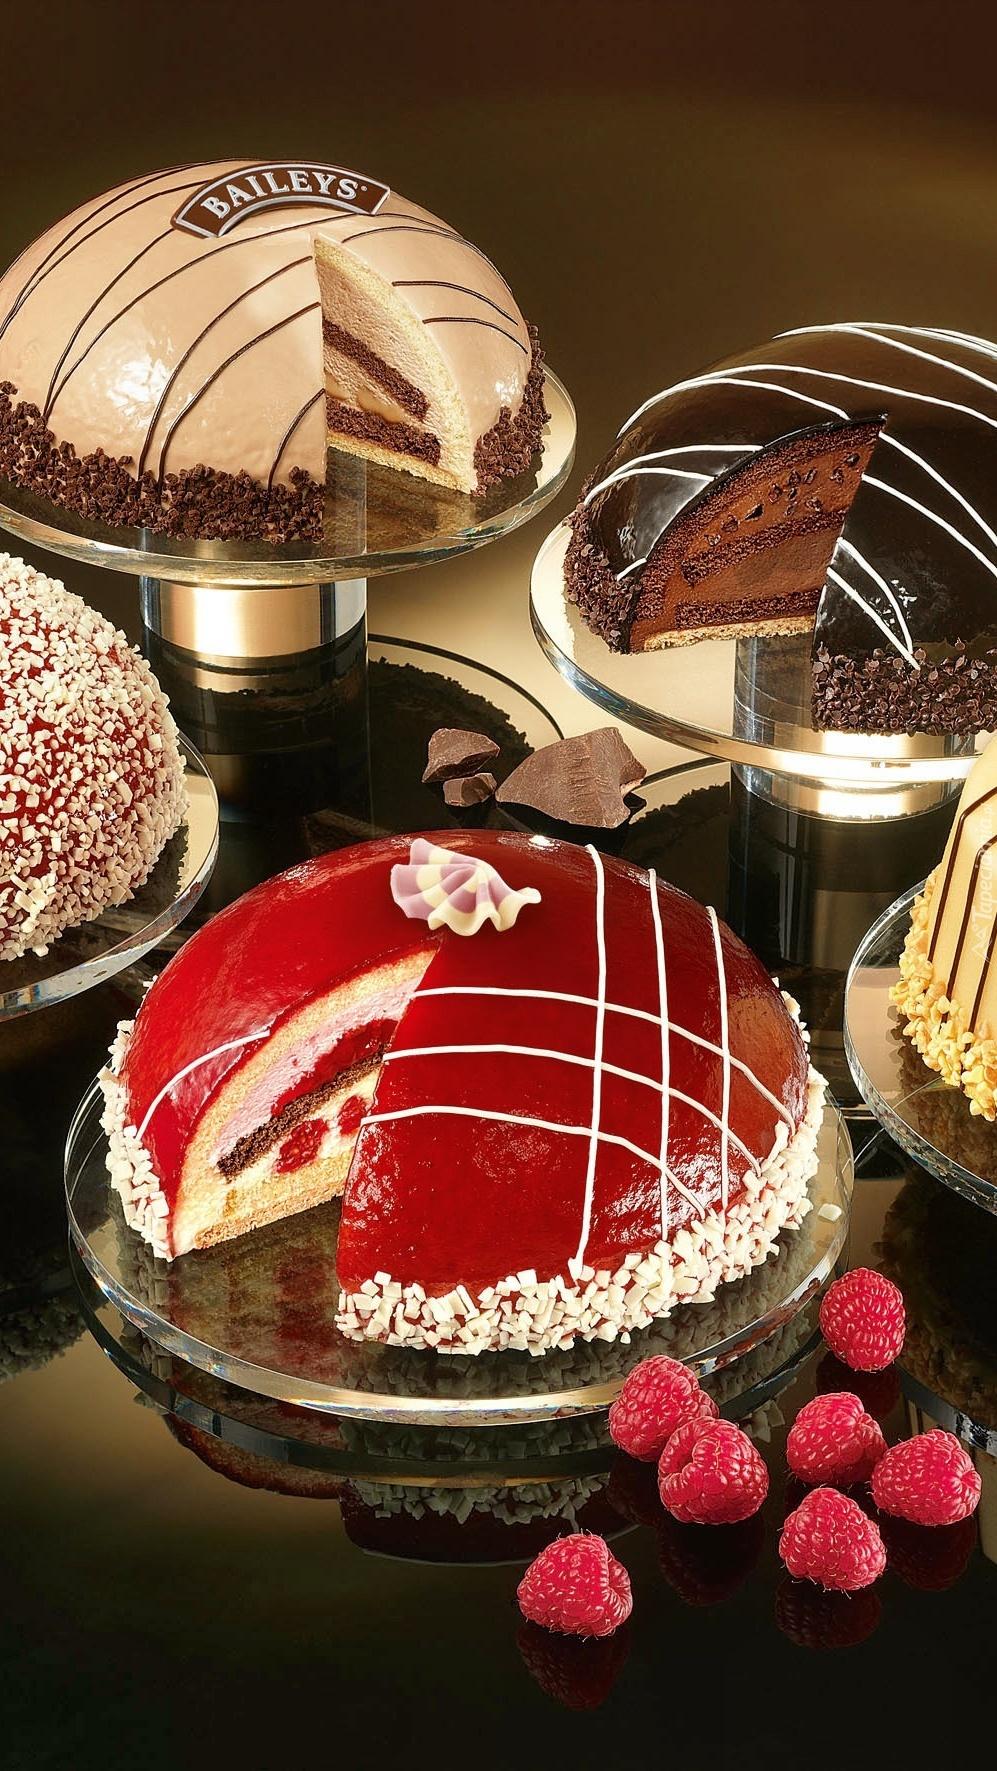 Kolorowe ciasta na paterach